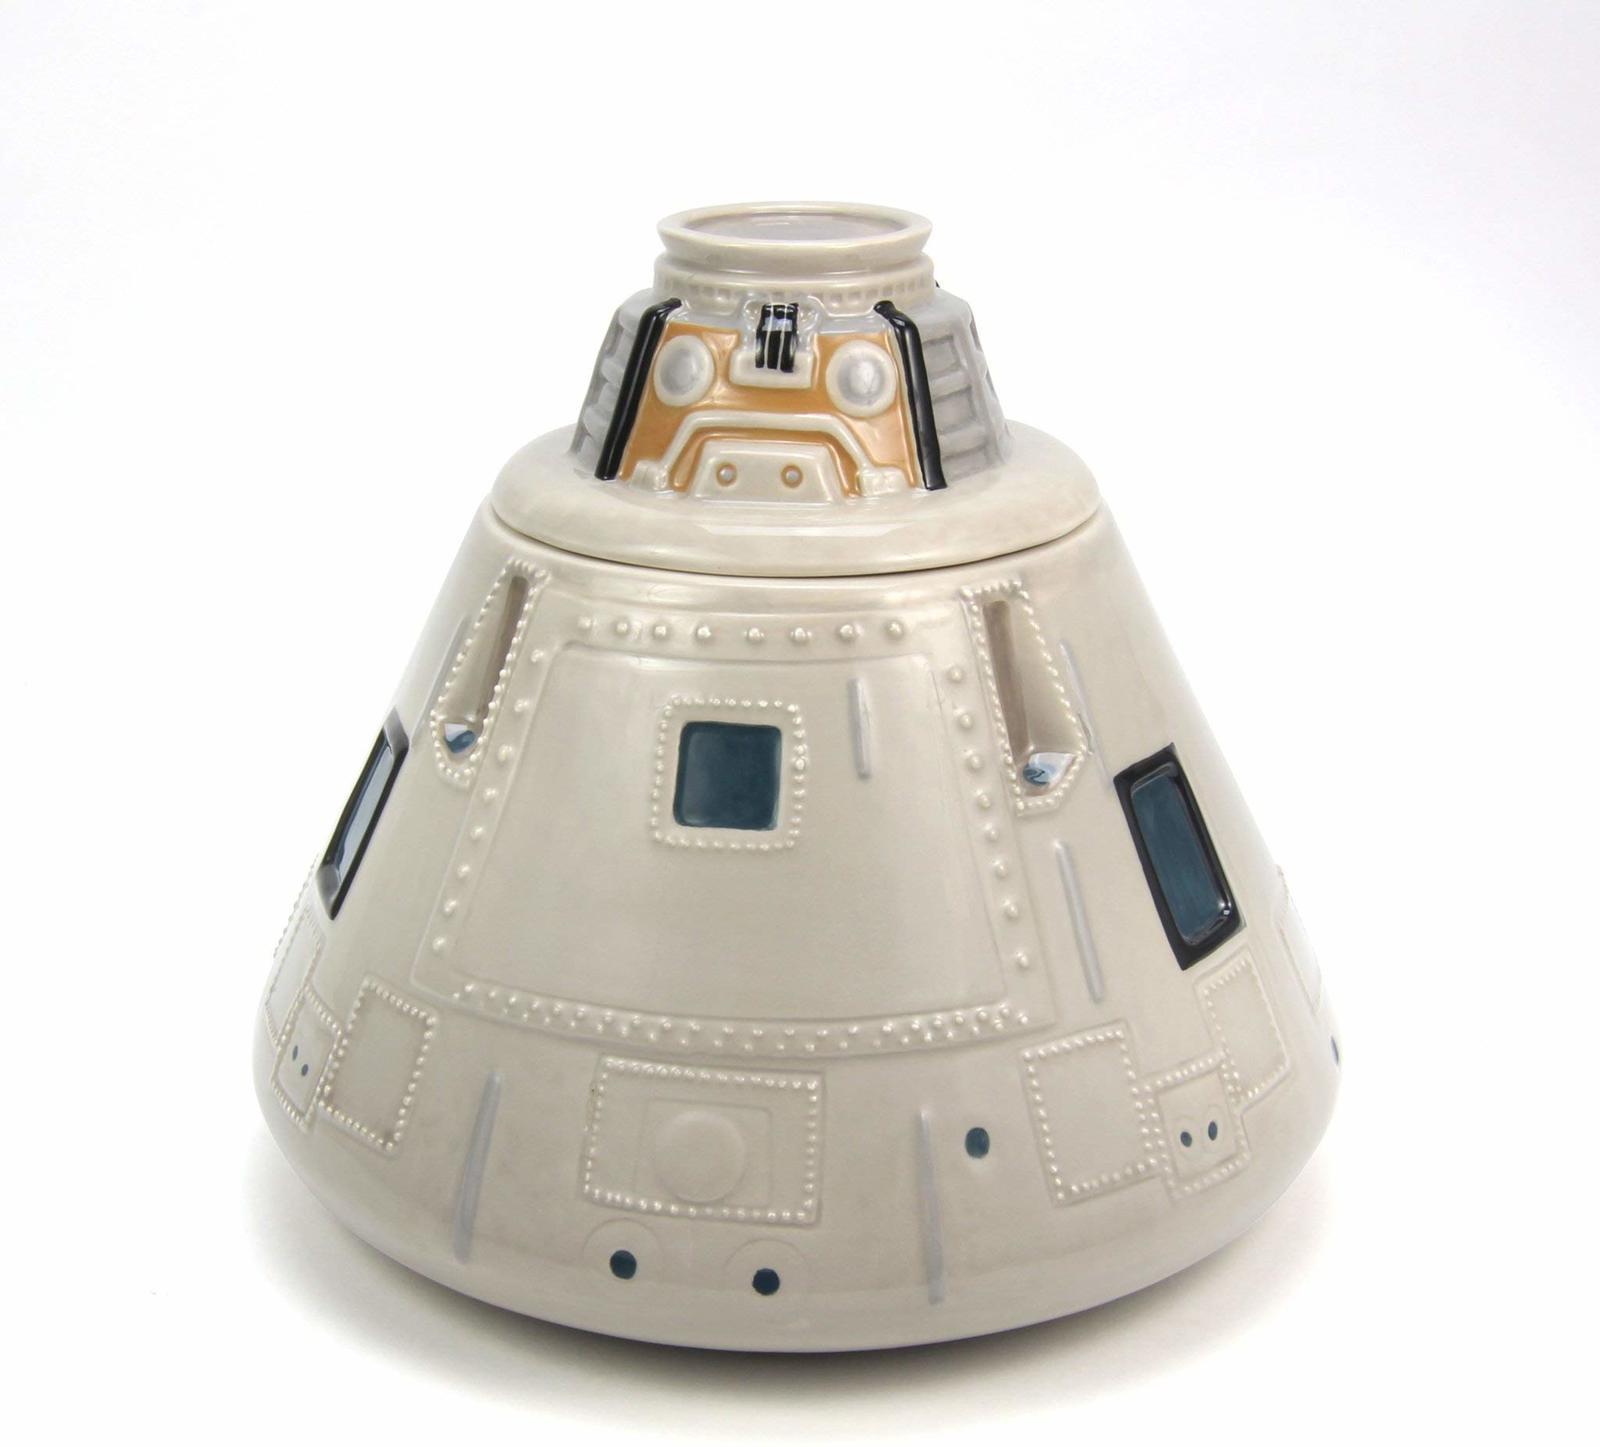 NASA: Apollo Capsule Cookie Jar image